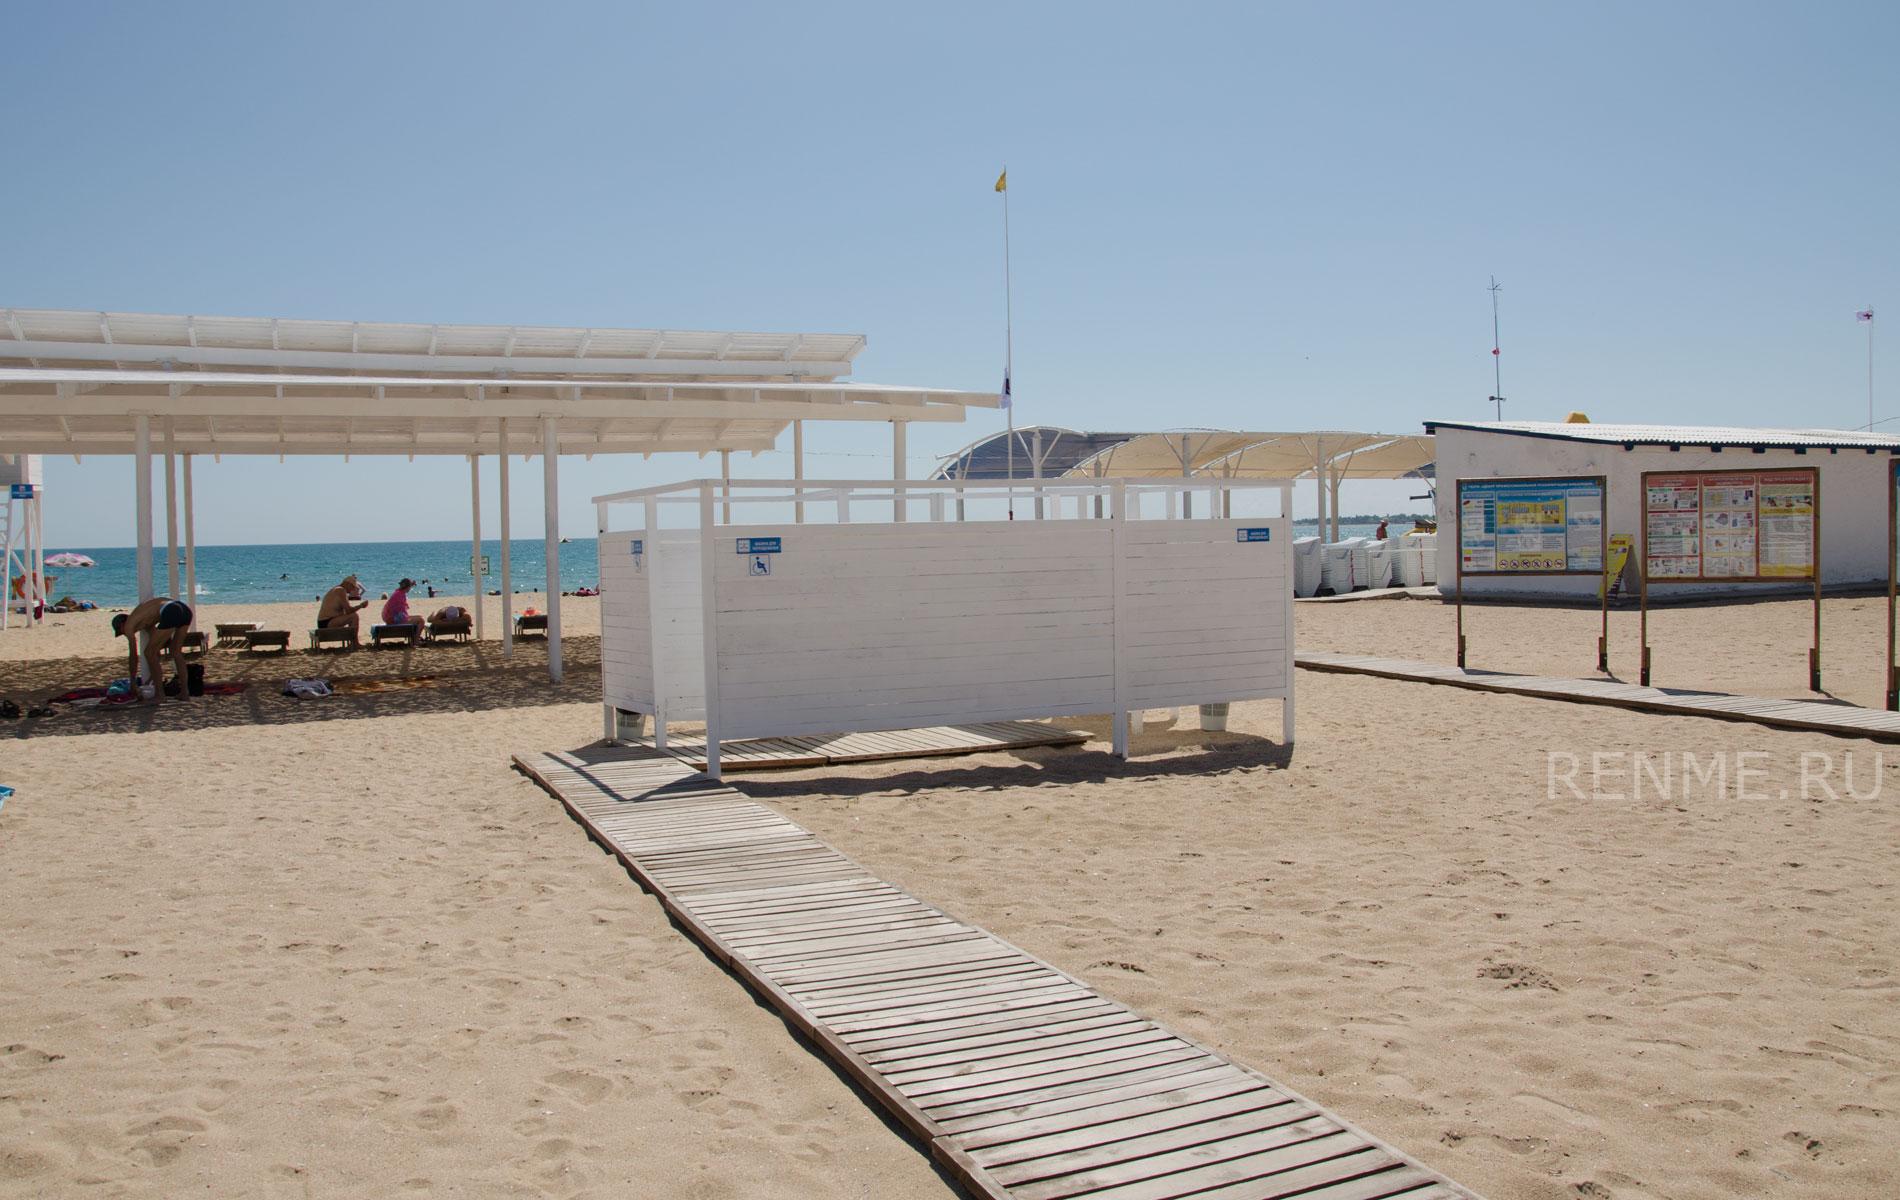 Раздевалки на Евпаторийском пляже. Фото Евпатории